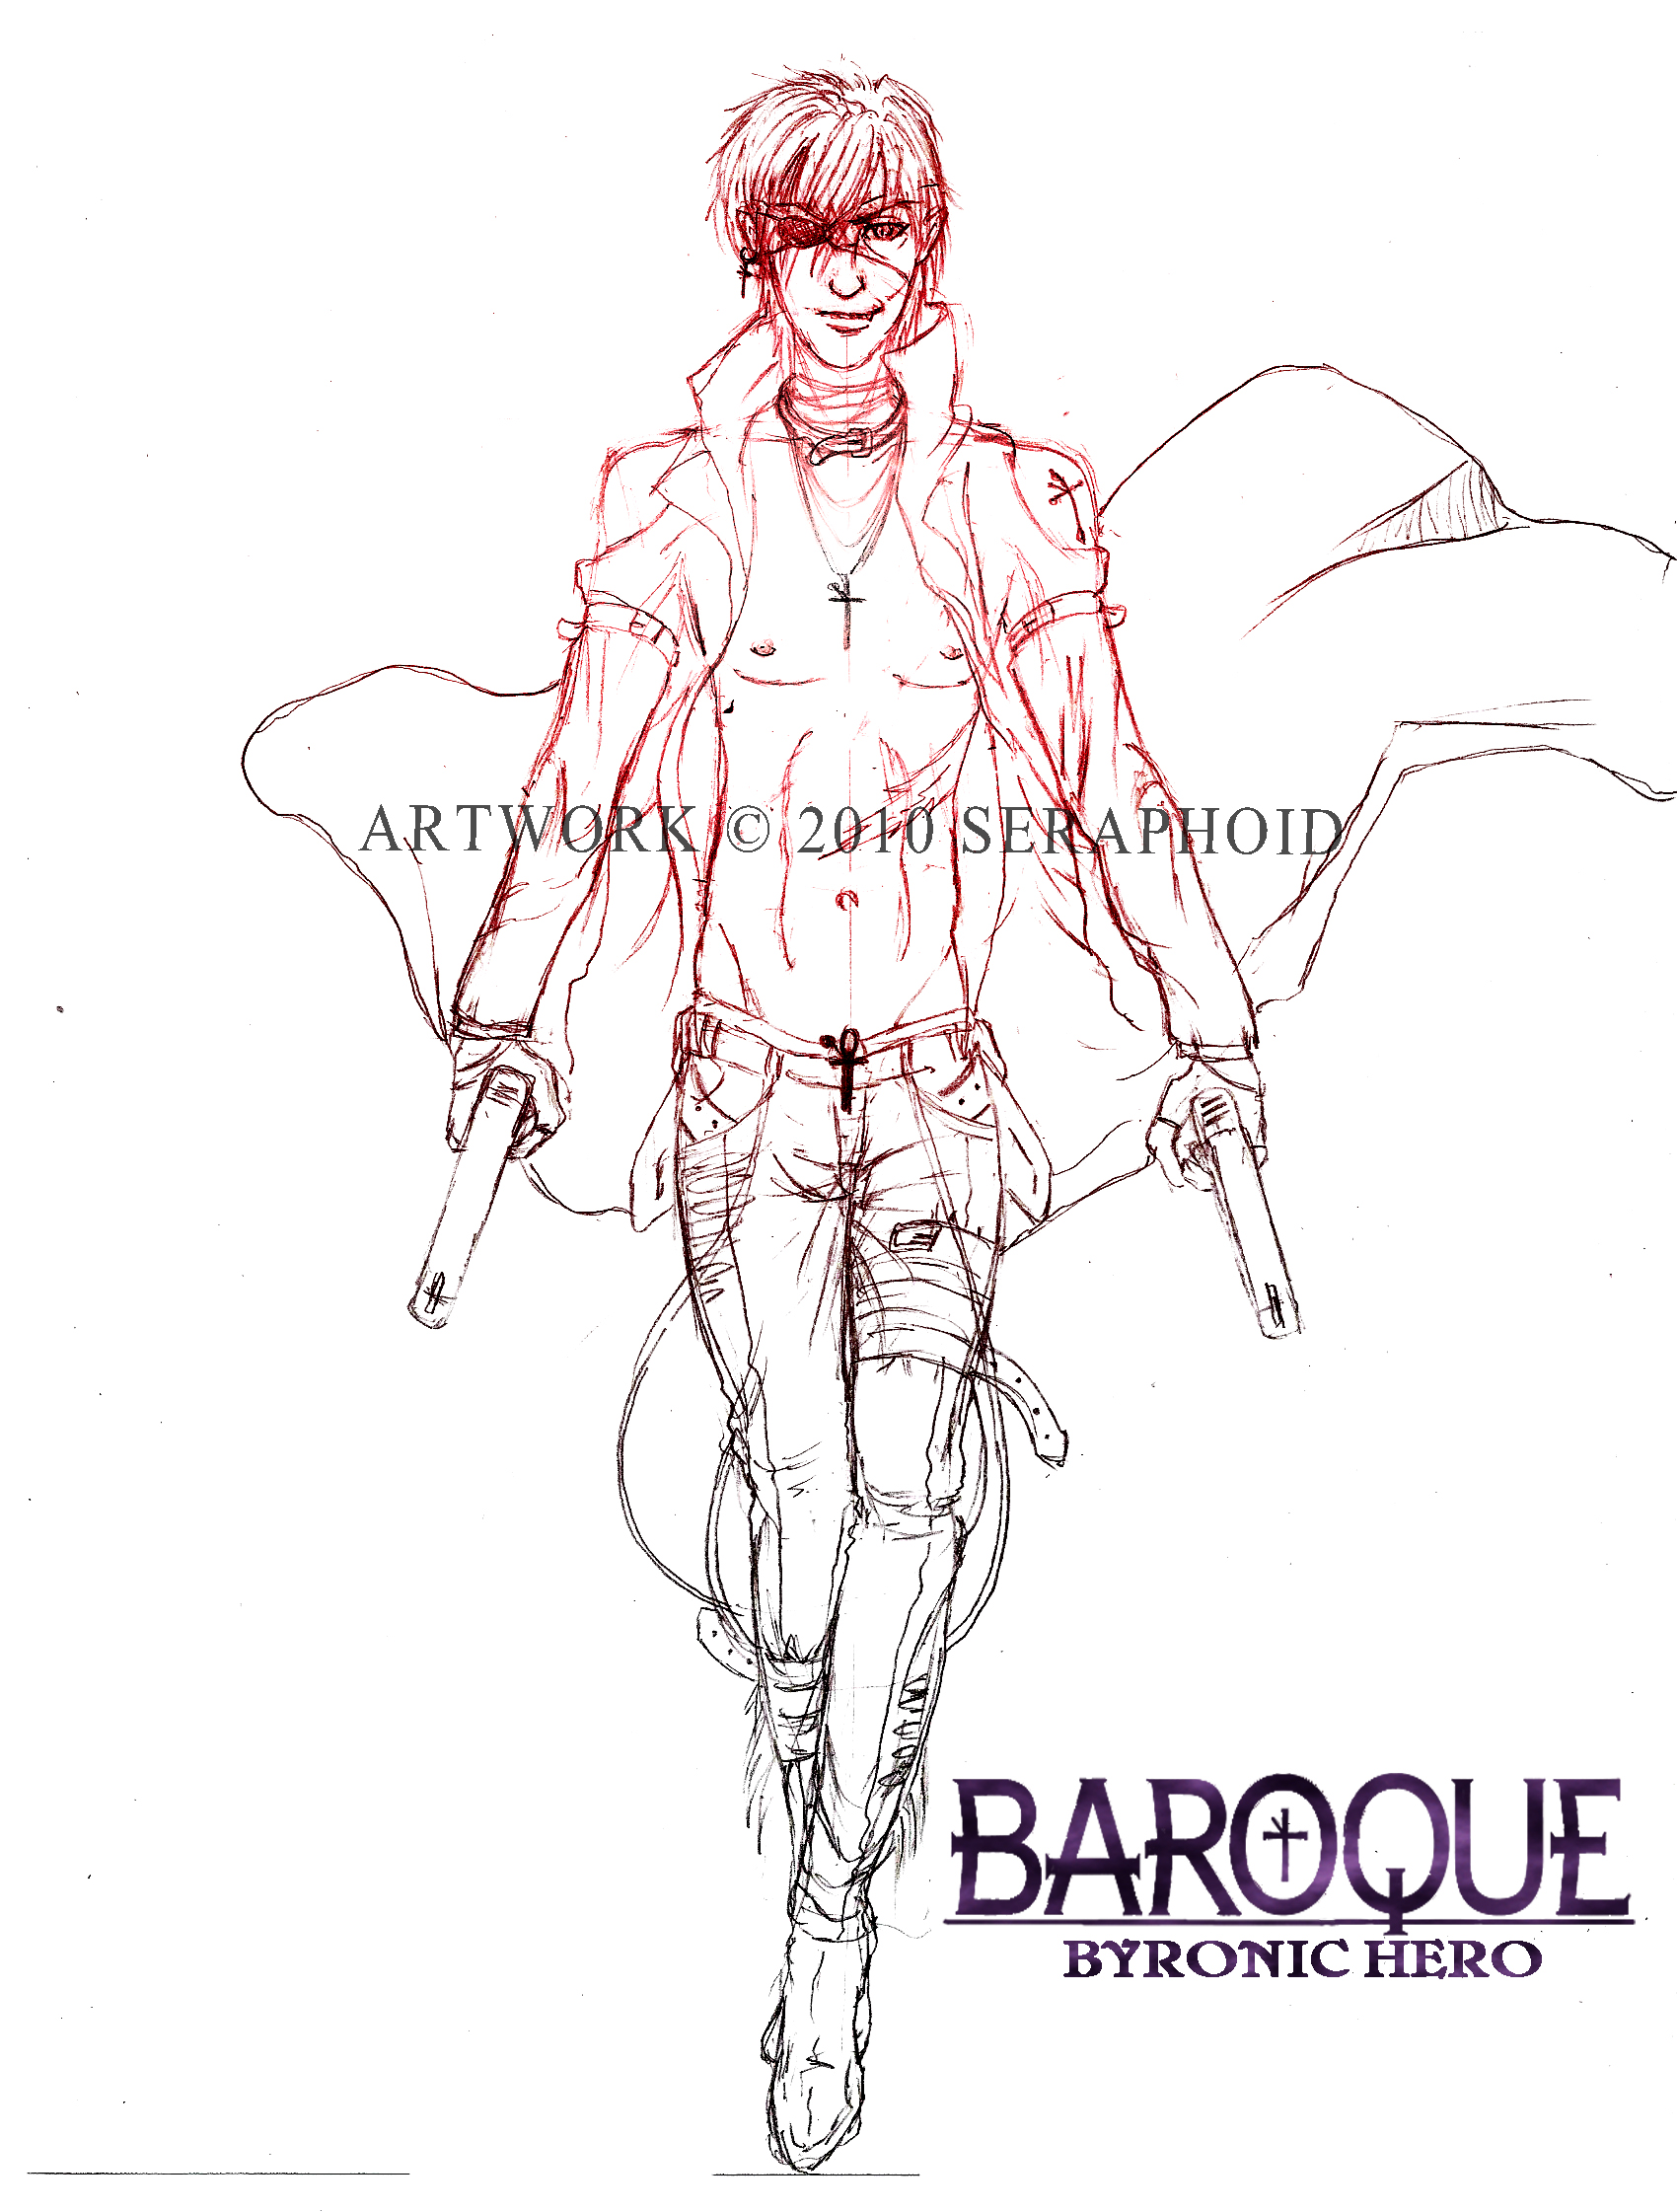 byronic explore byronic on baroque oc sketch byronic hero by seraphoid